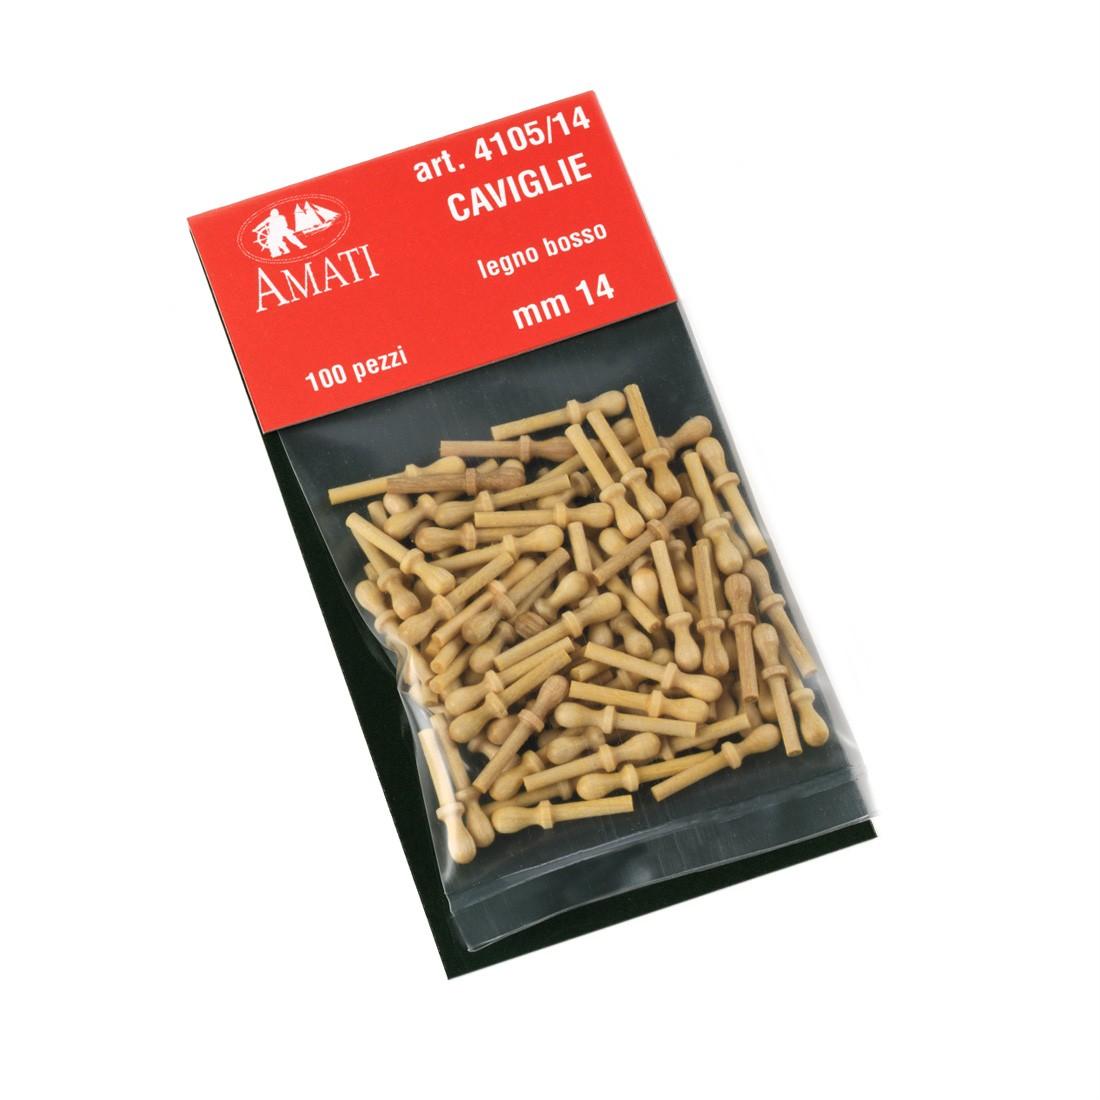 Boxwood belaying pins mm.14